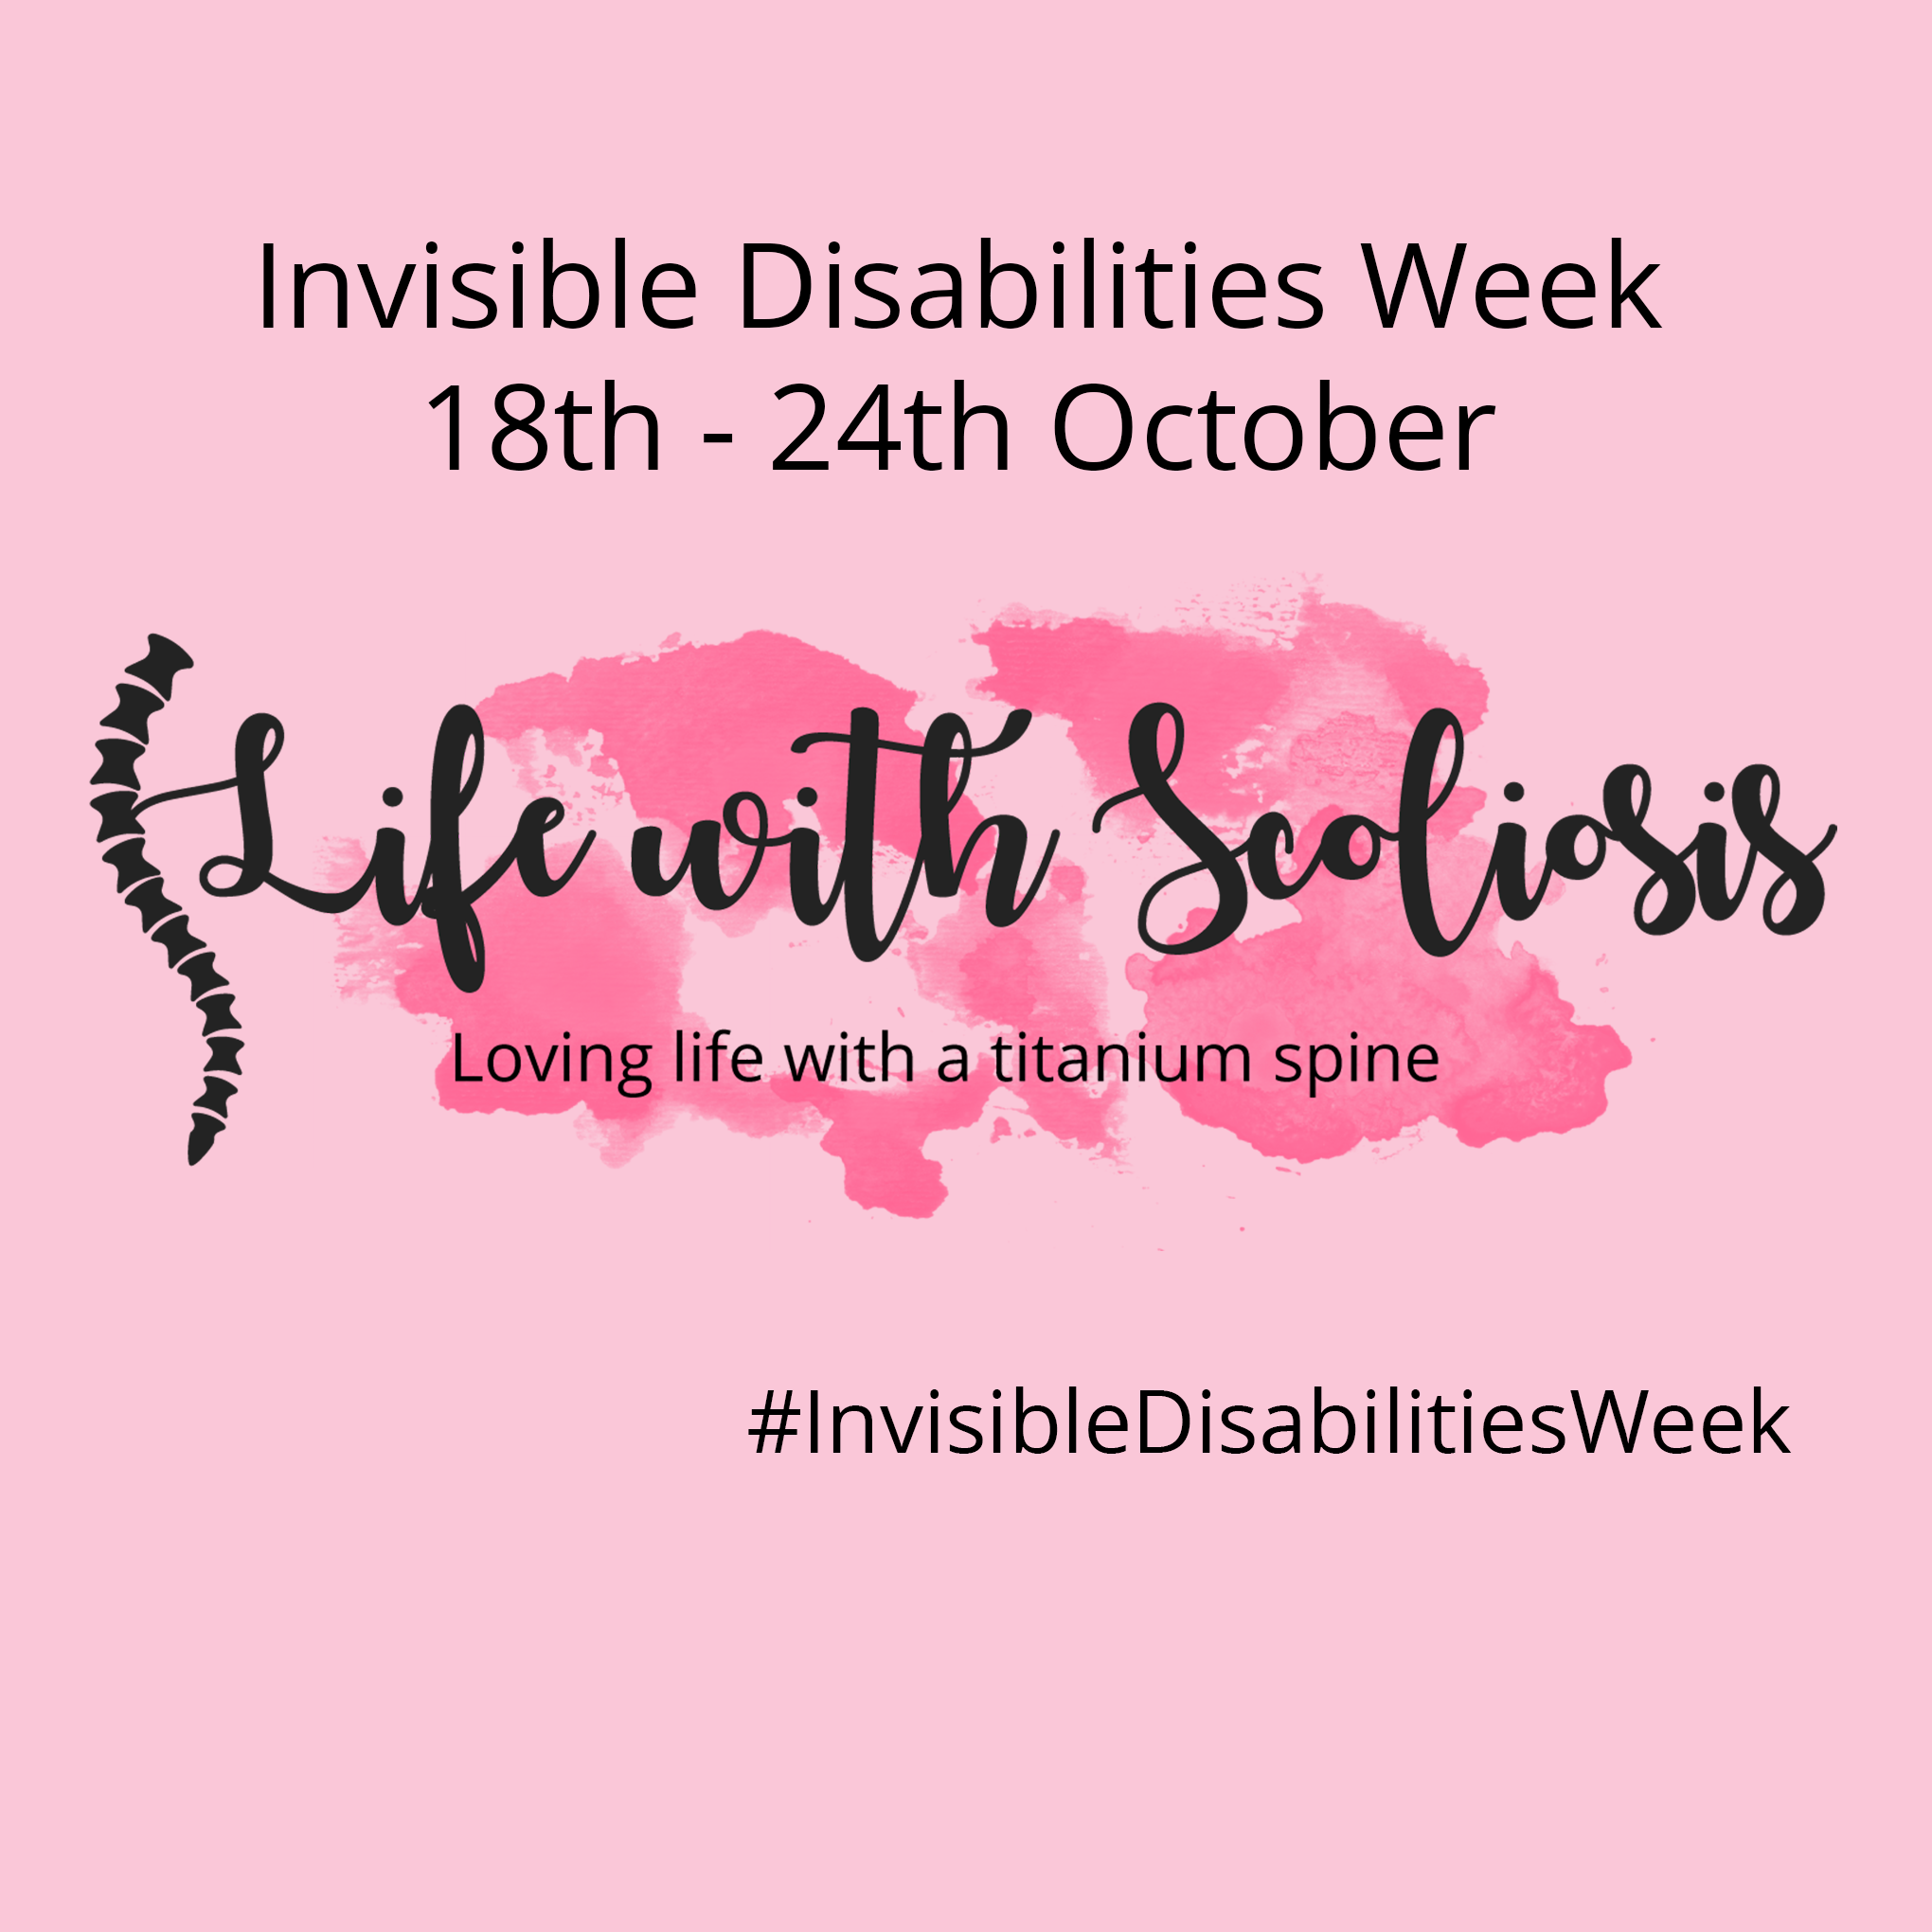 InvisibleDisabilitiesWeek